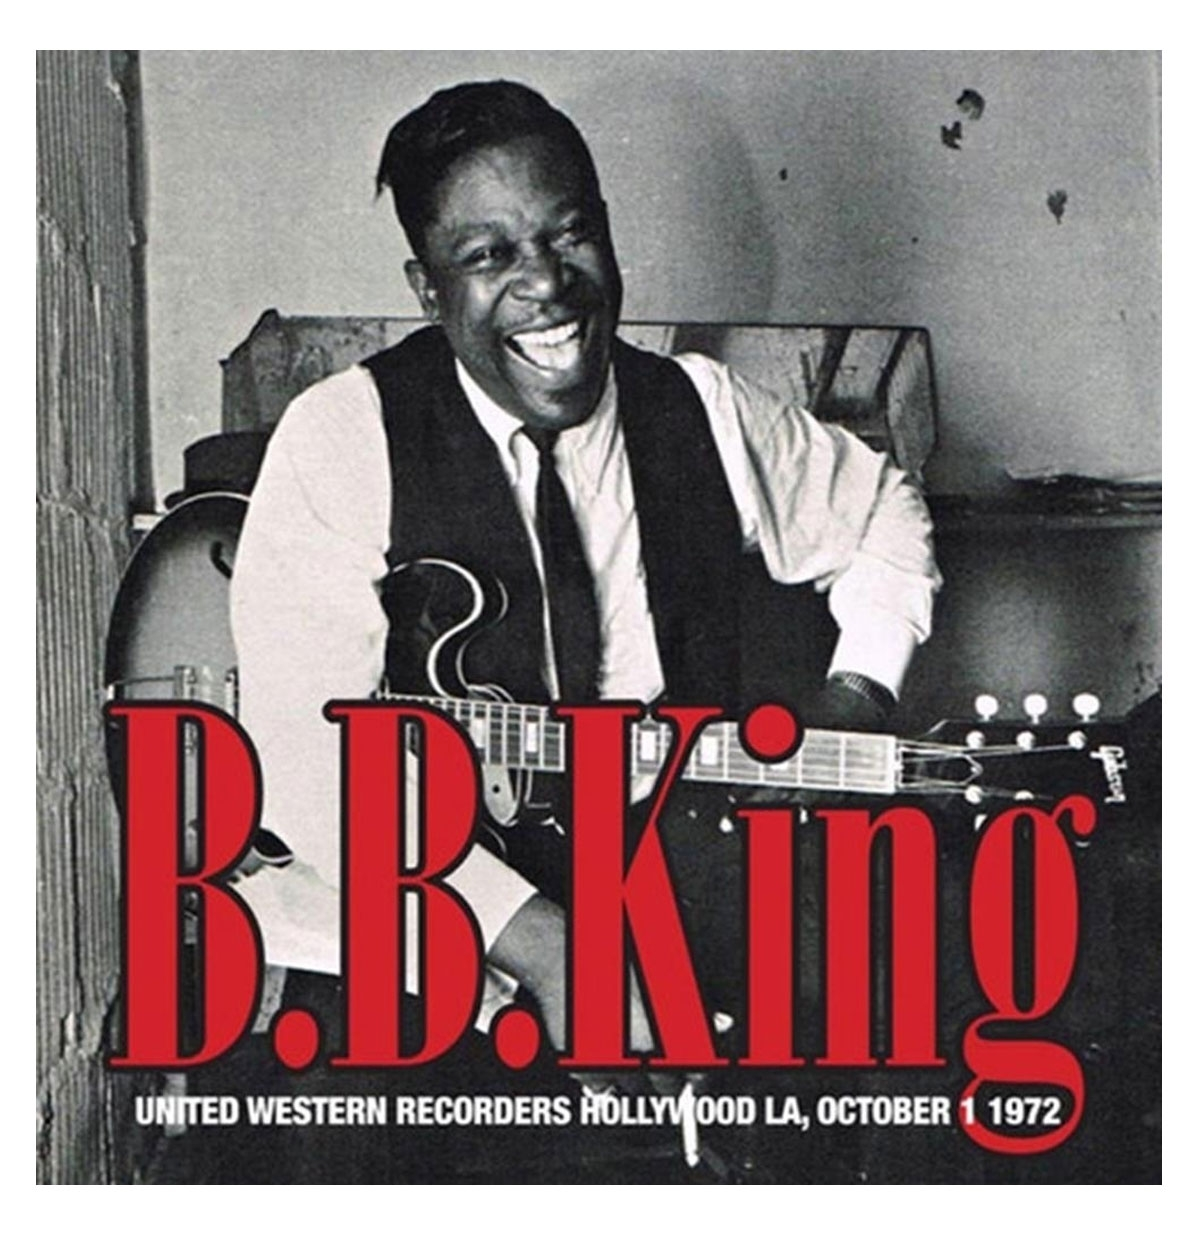 B.B. King - United Western Recorders Hollywood, LA, October 1, 1972 2-LP